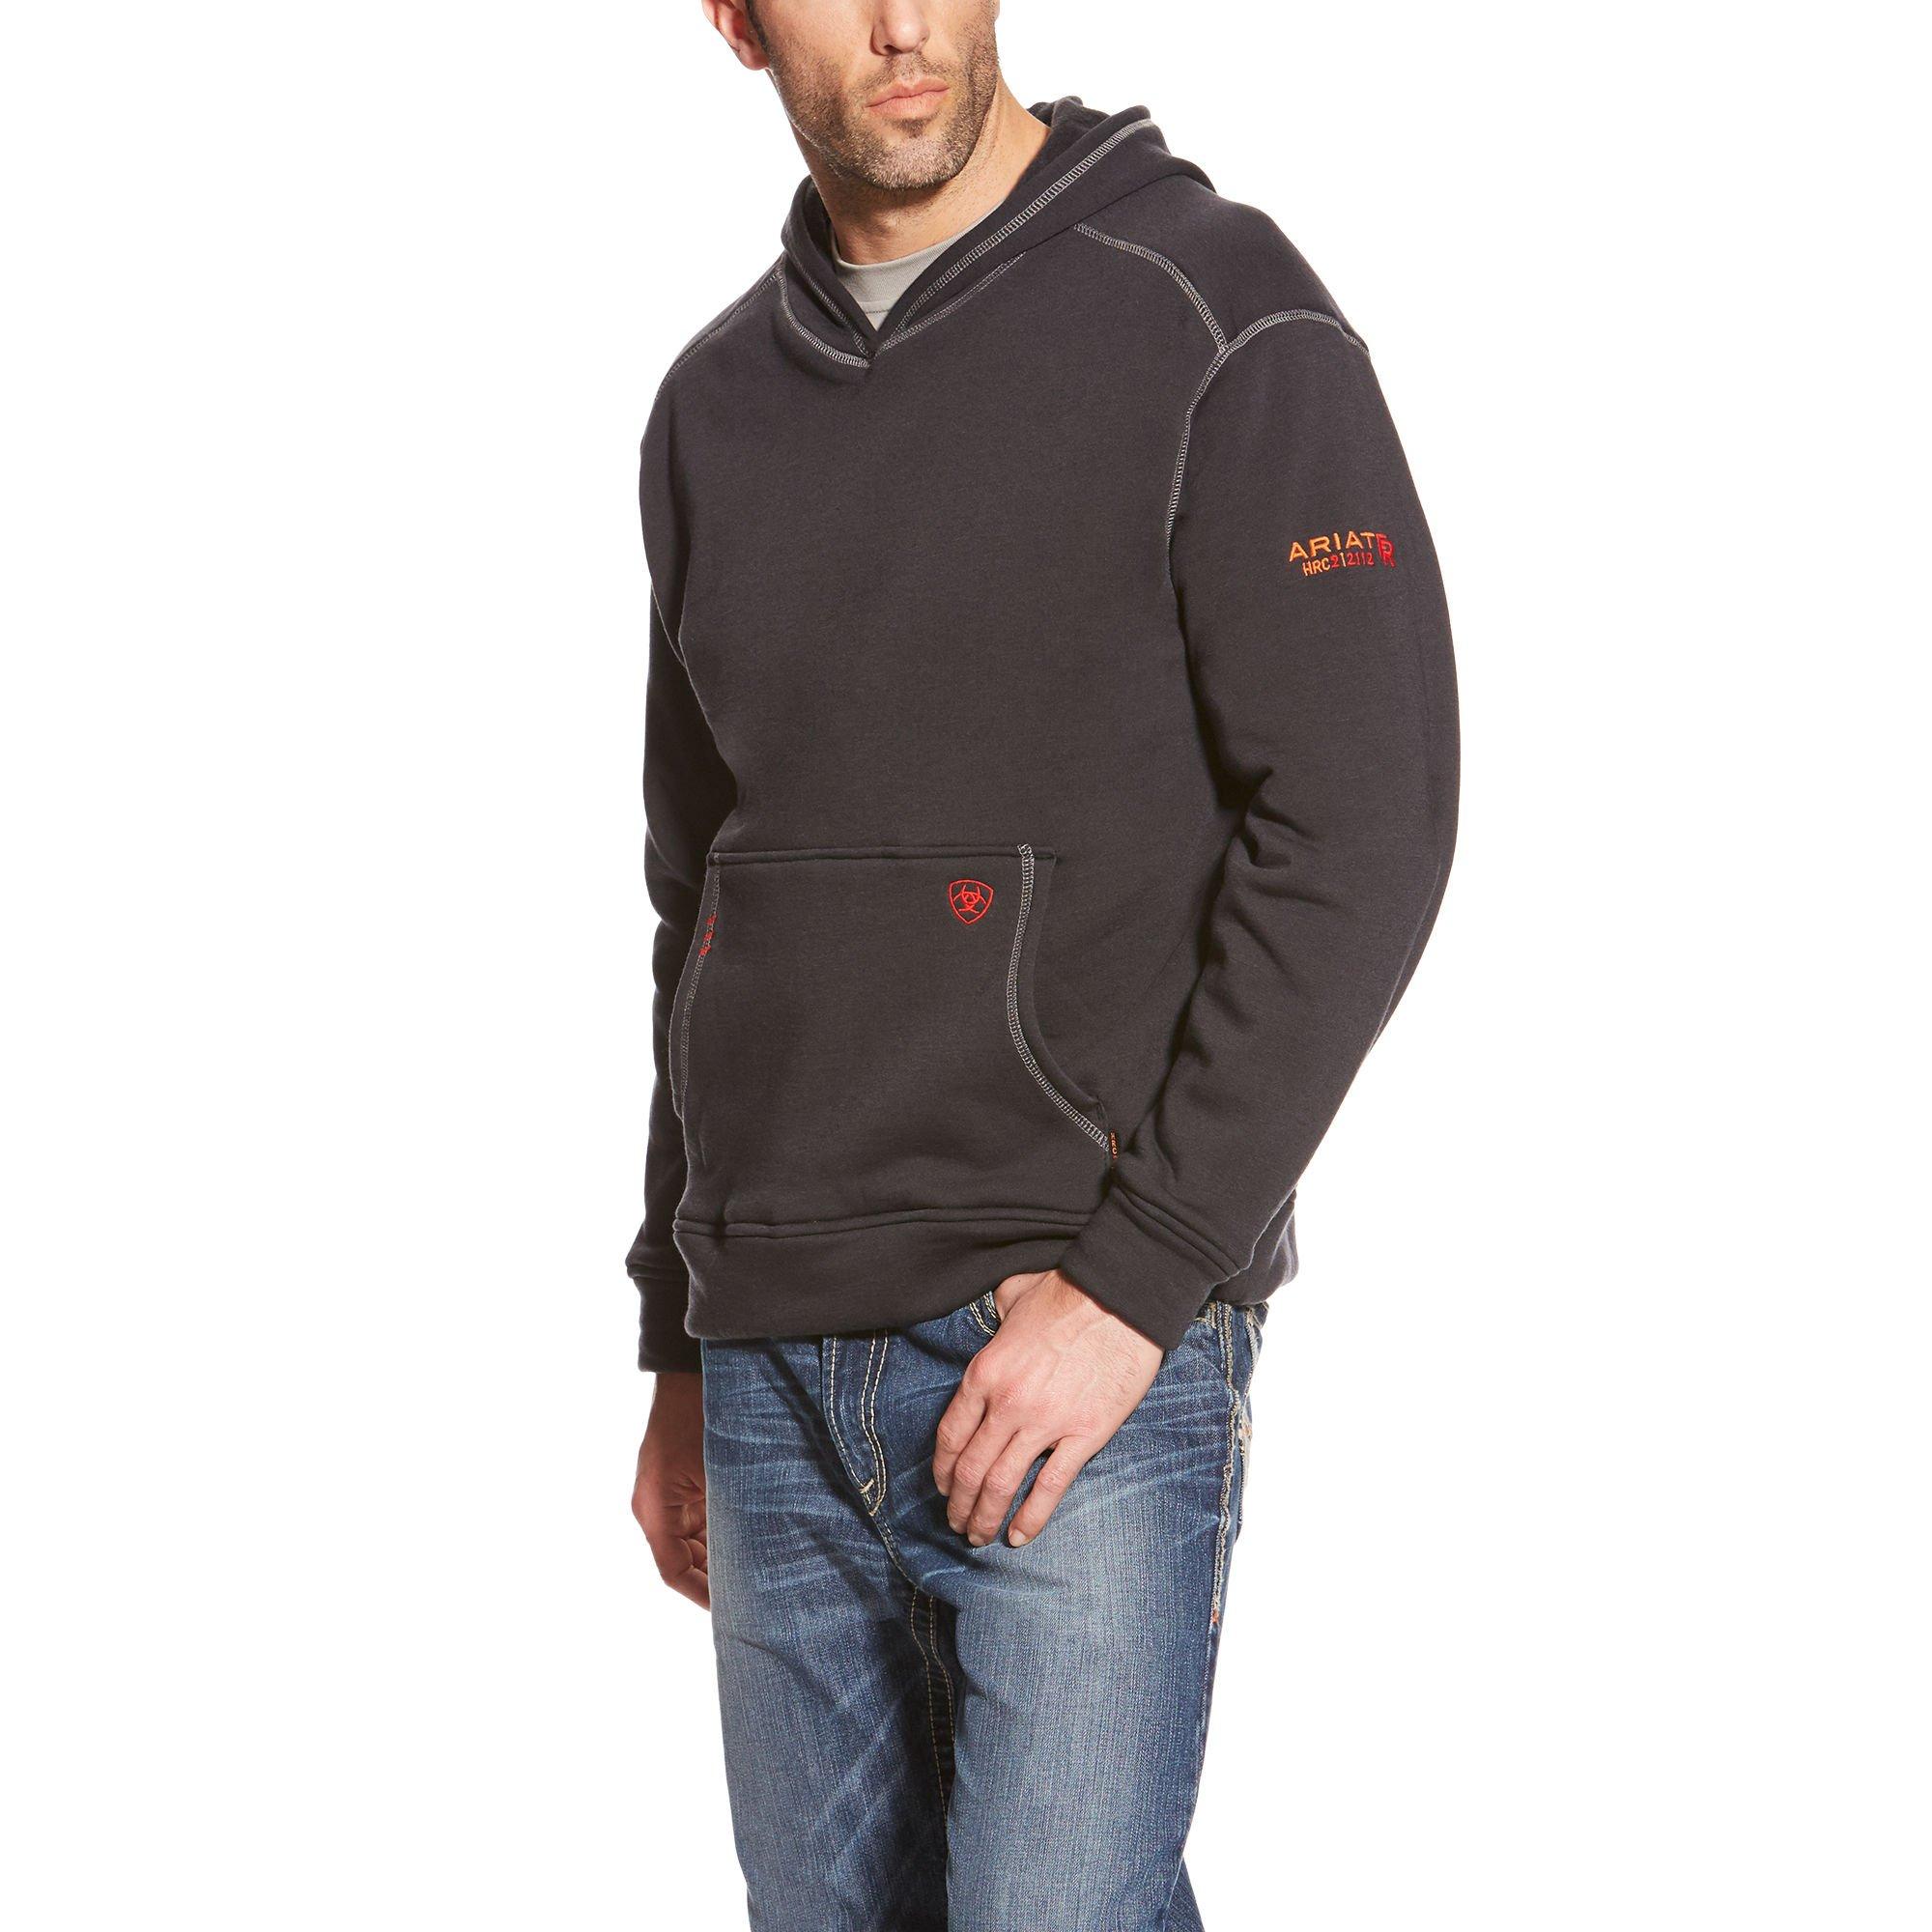 Ariat Men's Flame Resistant Polartec Hoodie, Black, Large